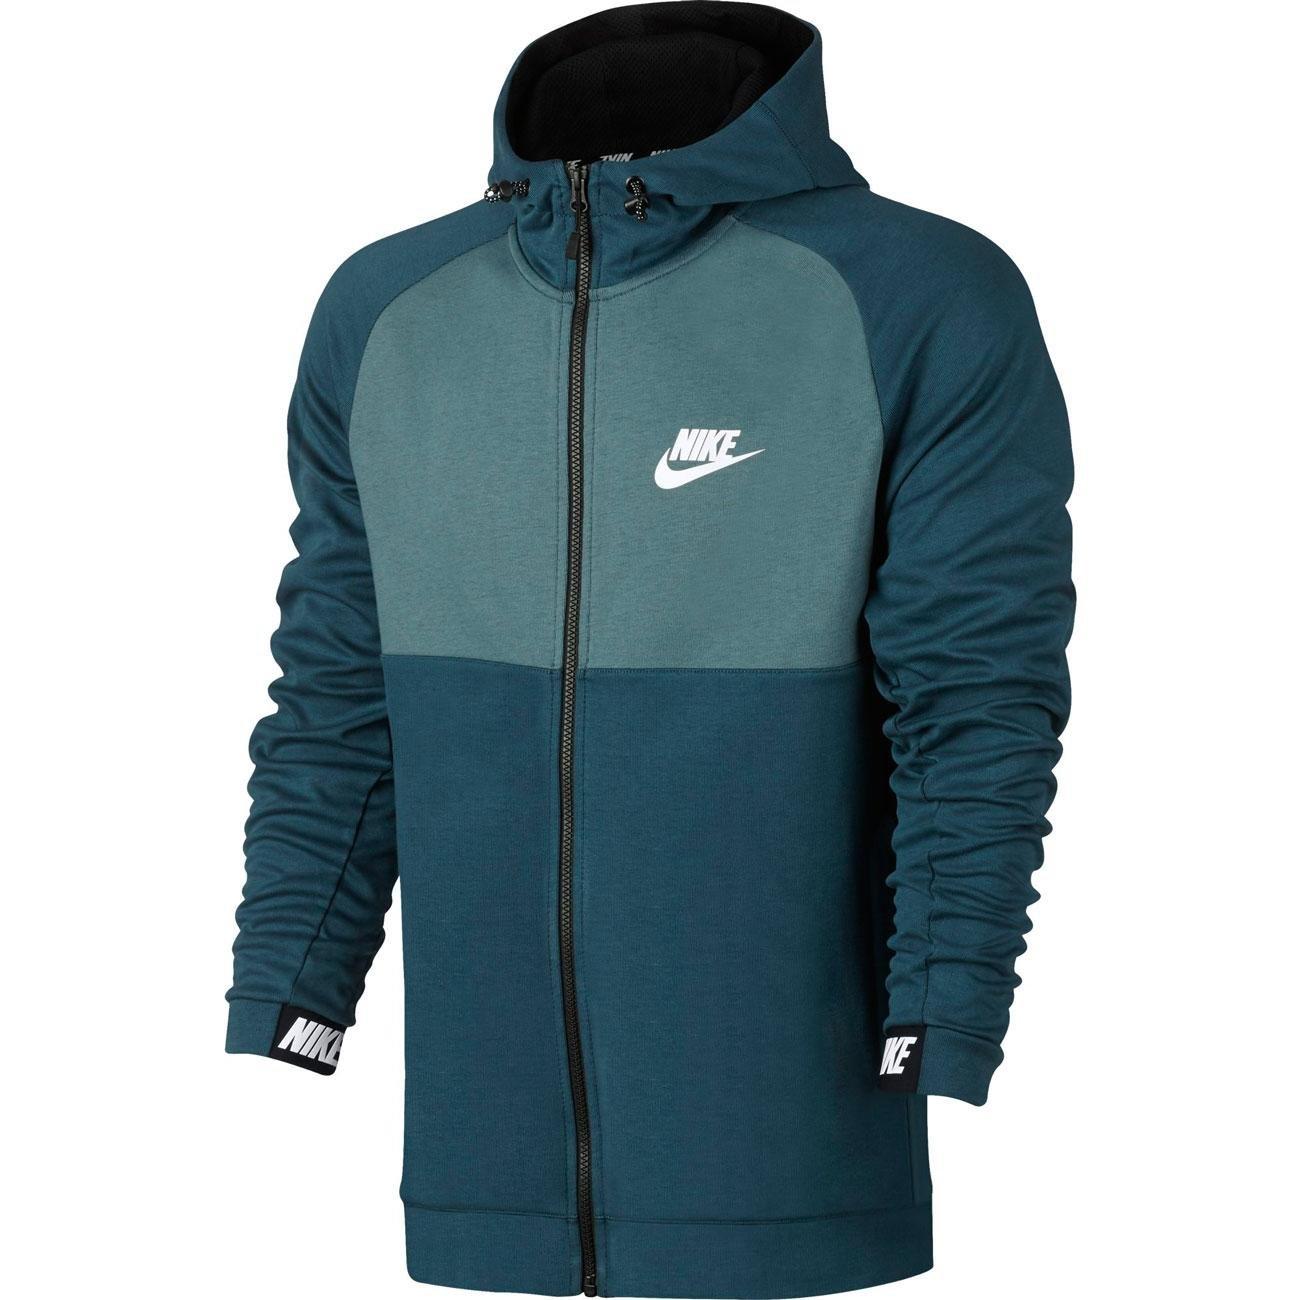 Nike NIKE NIKE NIKE M NSW AV15 HOODIE FZ FLC schwarz-grünblau-grau 190415